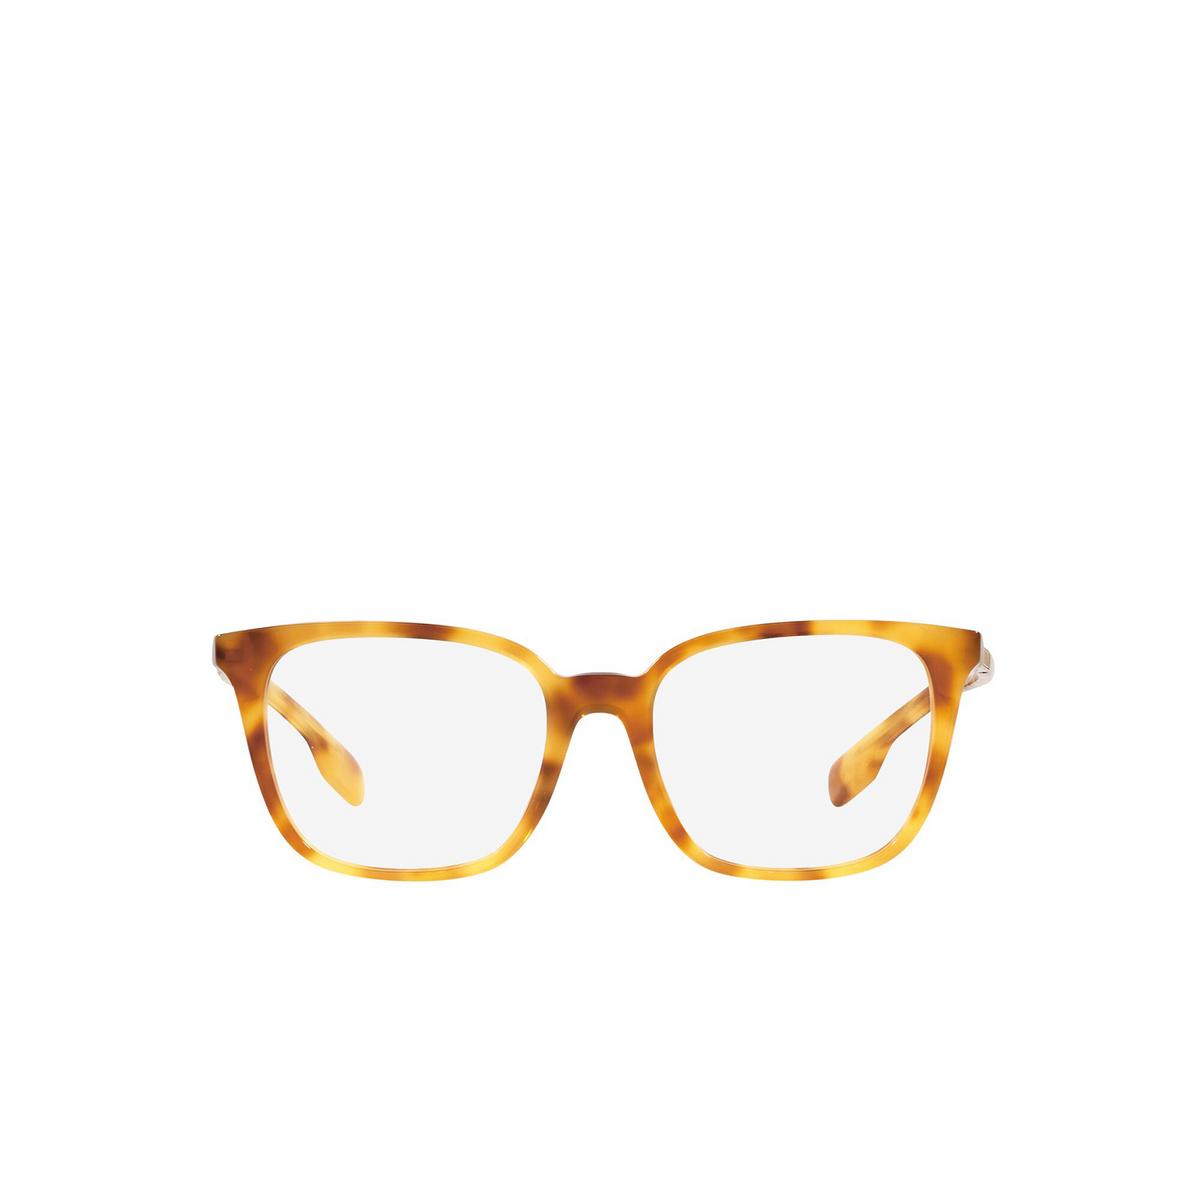 Burberry® Square Eyeglasses: Leah BE2338 color Light Havana 3908 - front view.